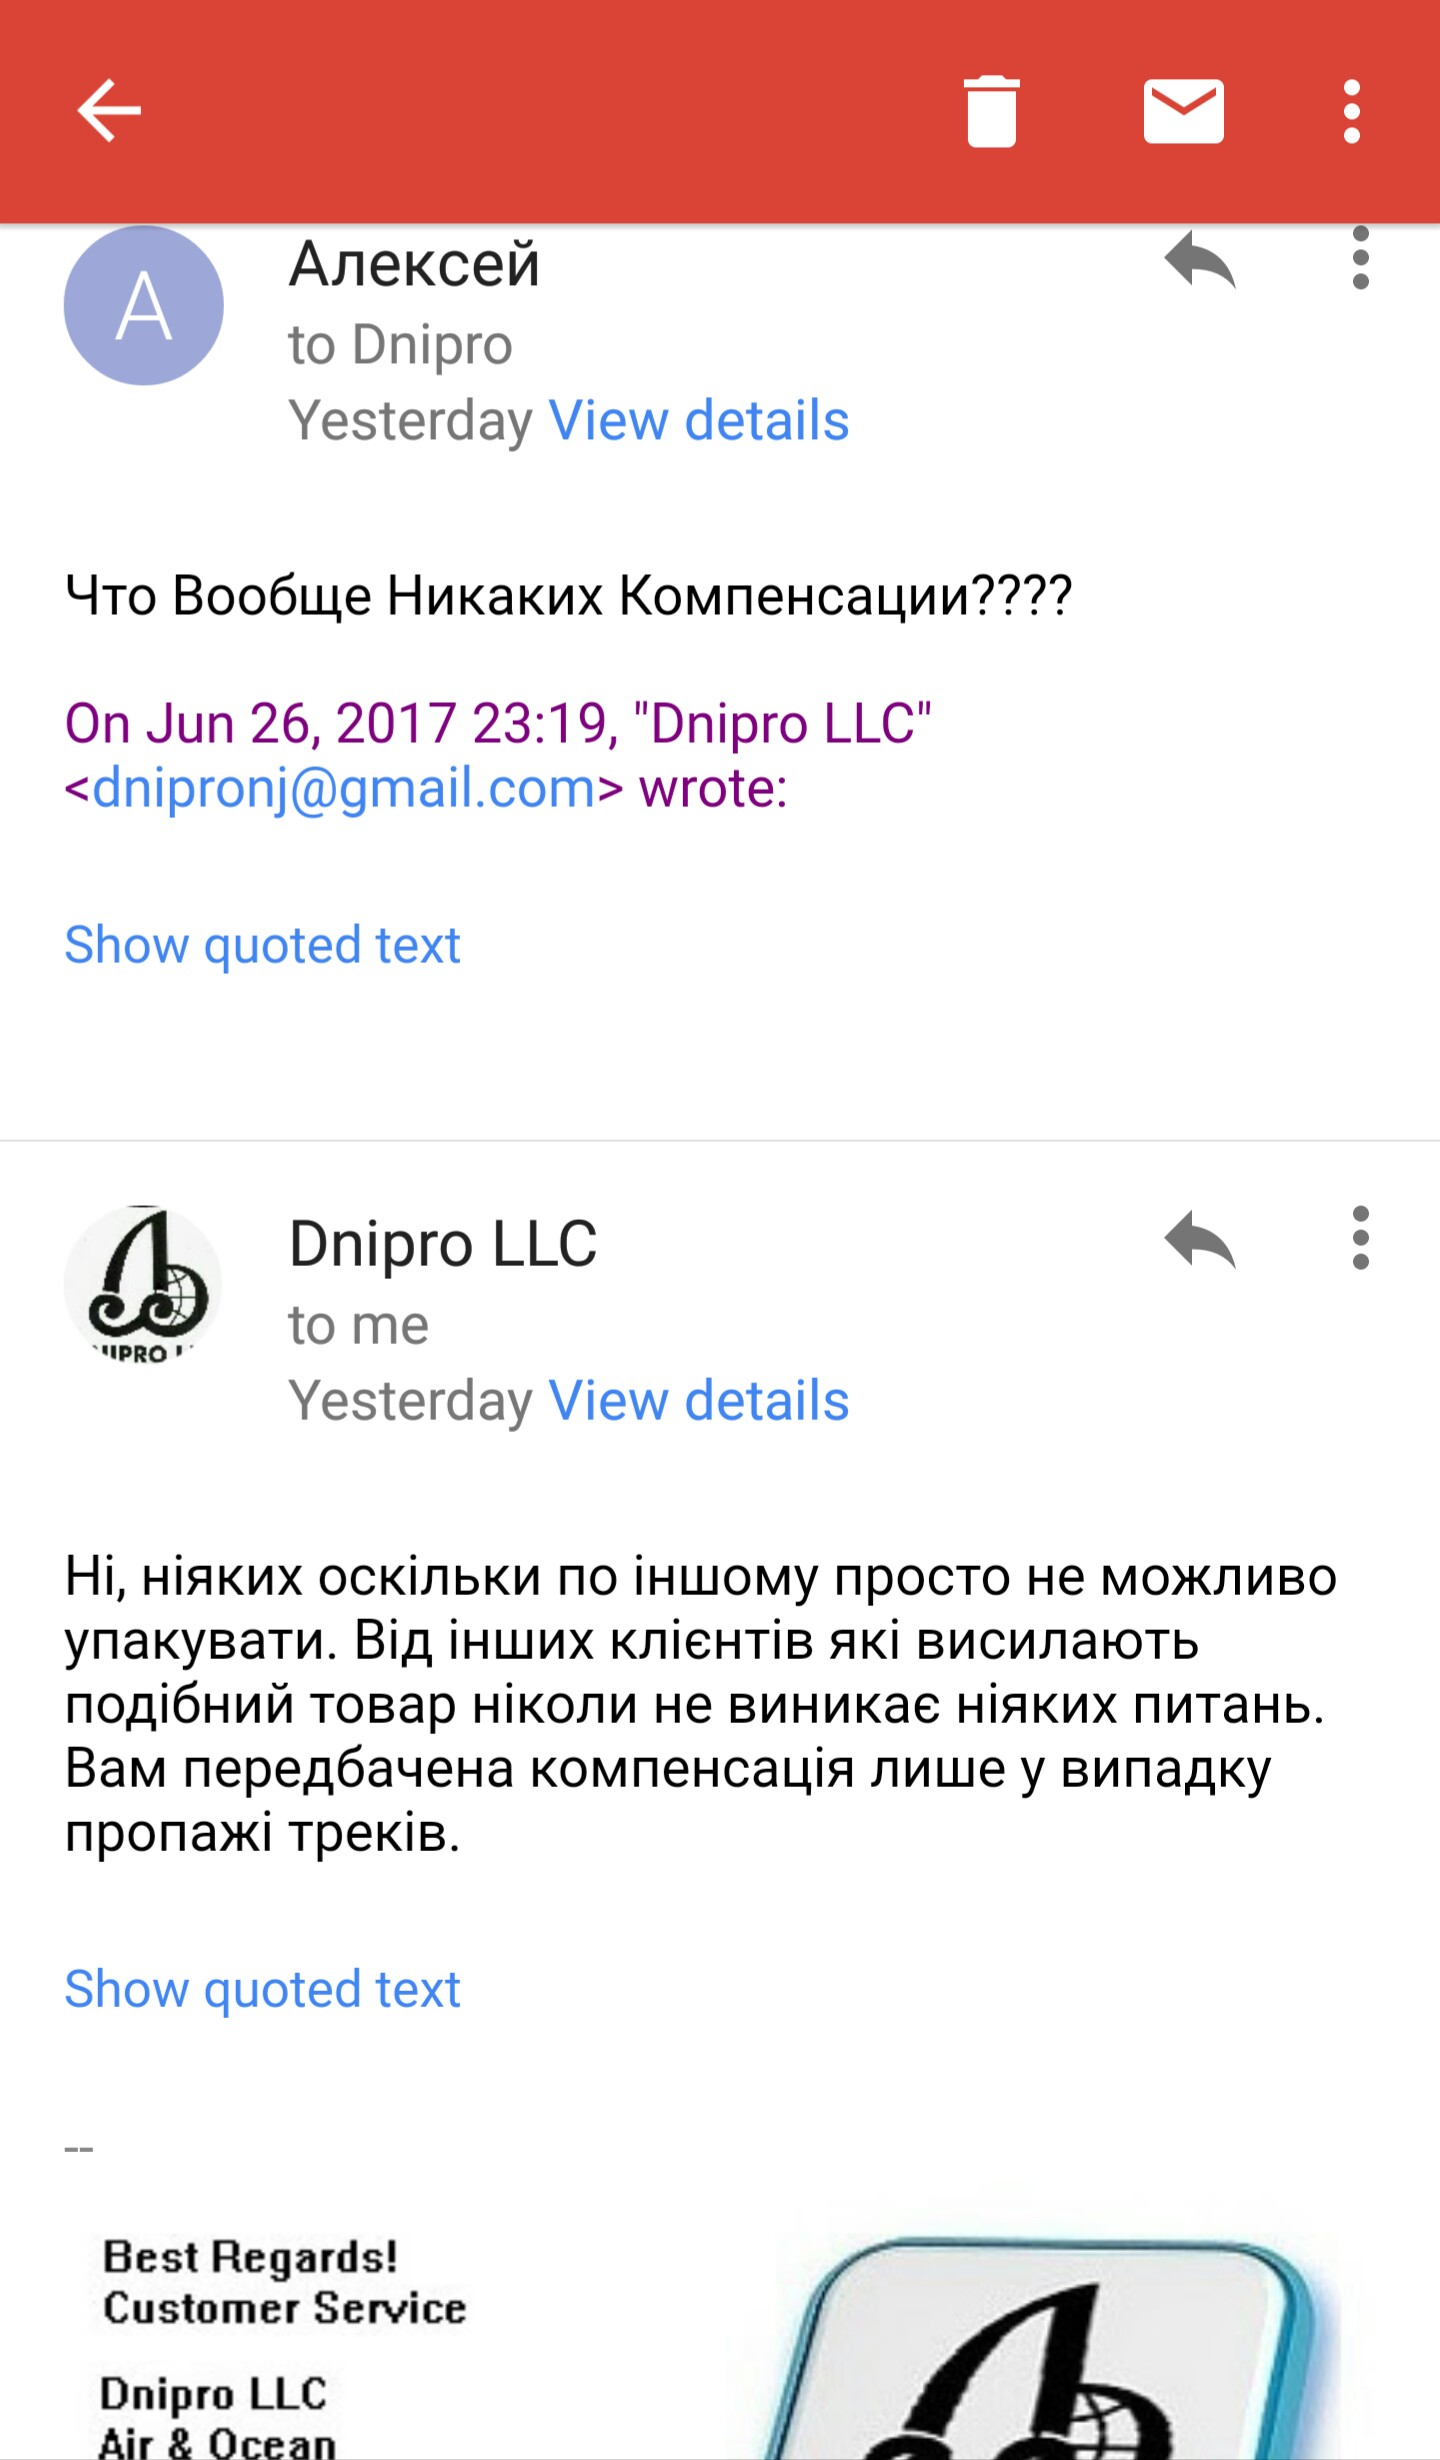 IMG_20170701_103051.